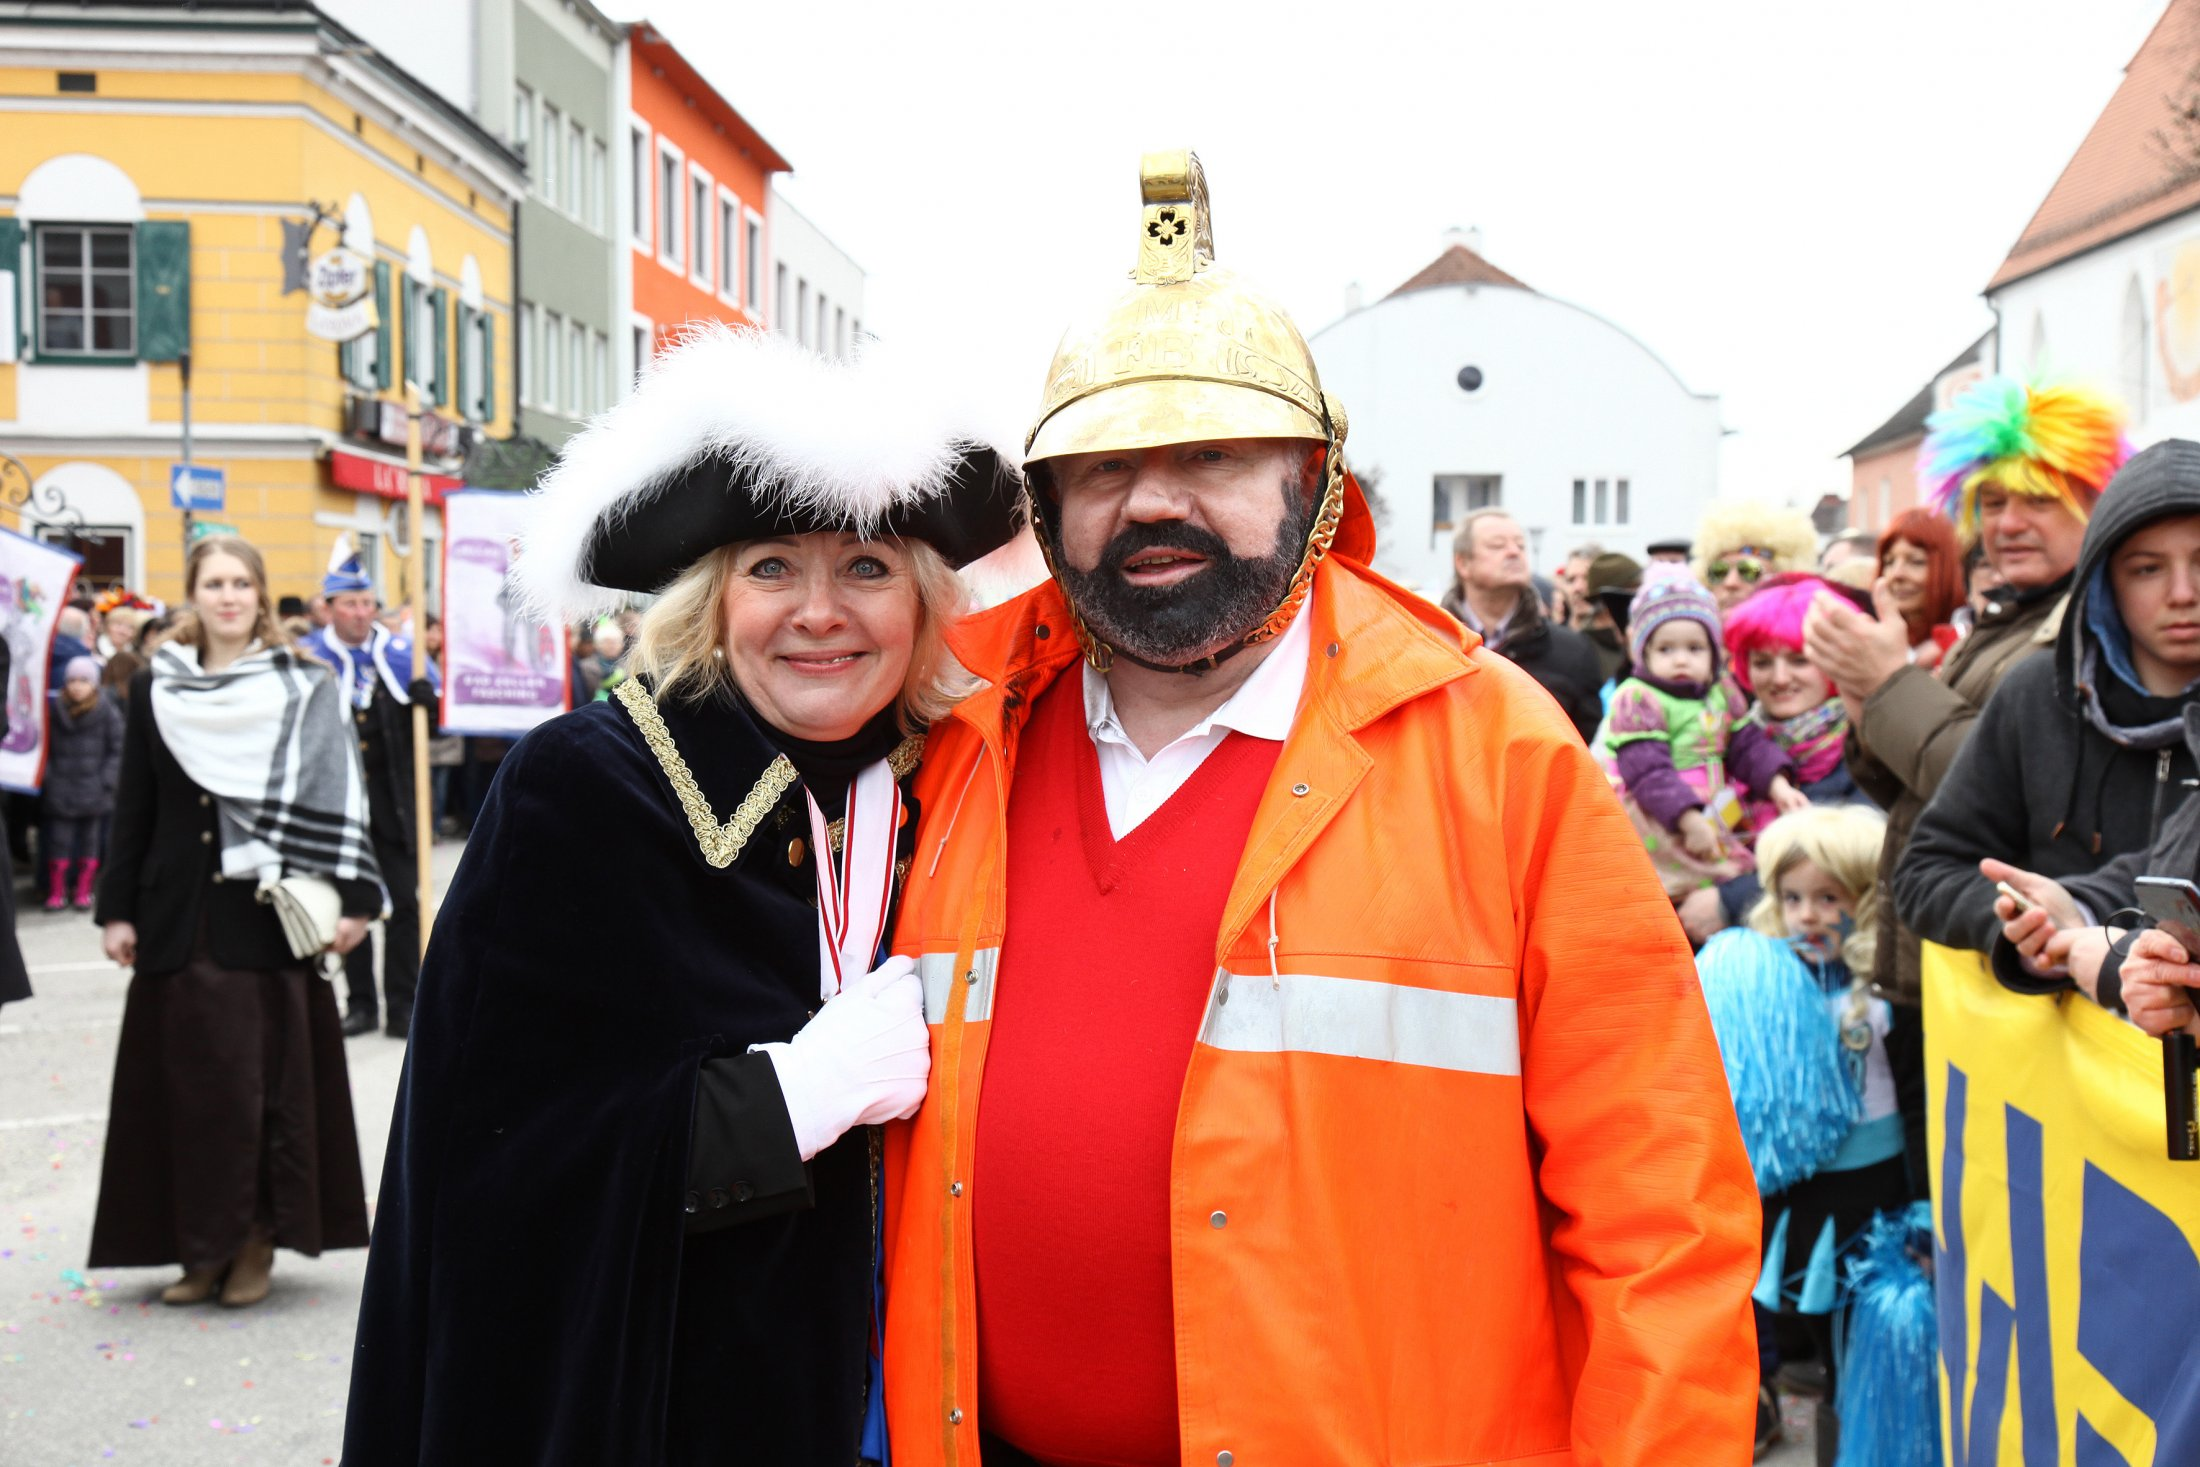 Faschingsumzug-Perg-2017172